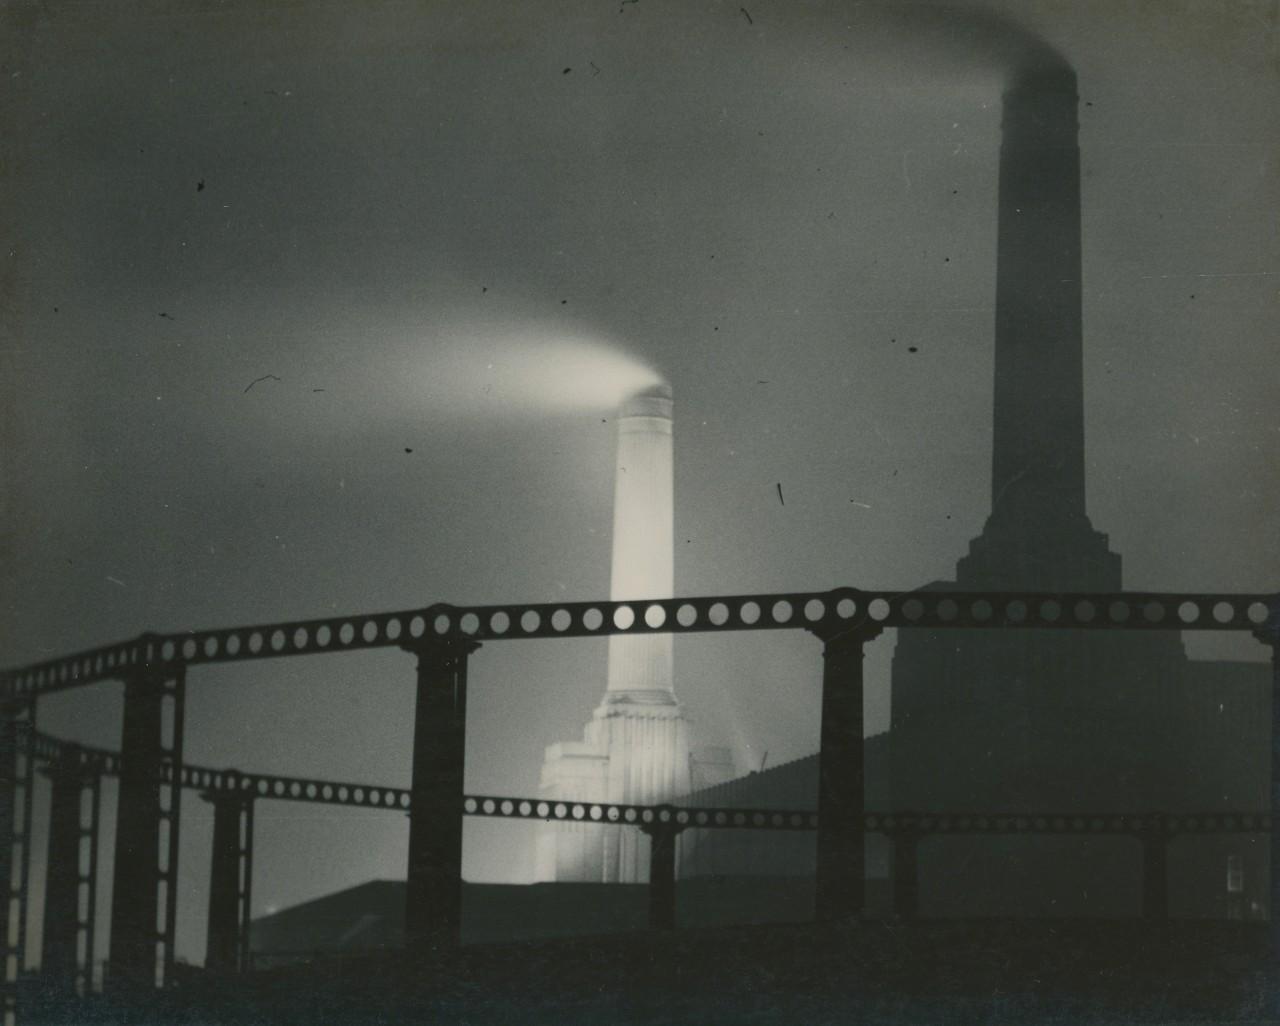 Электростанция Баттерси. Фотограф Билл Брандт